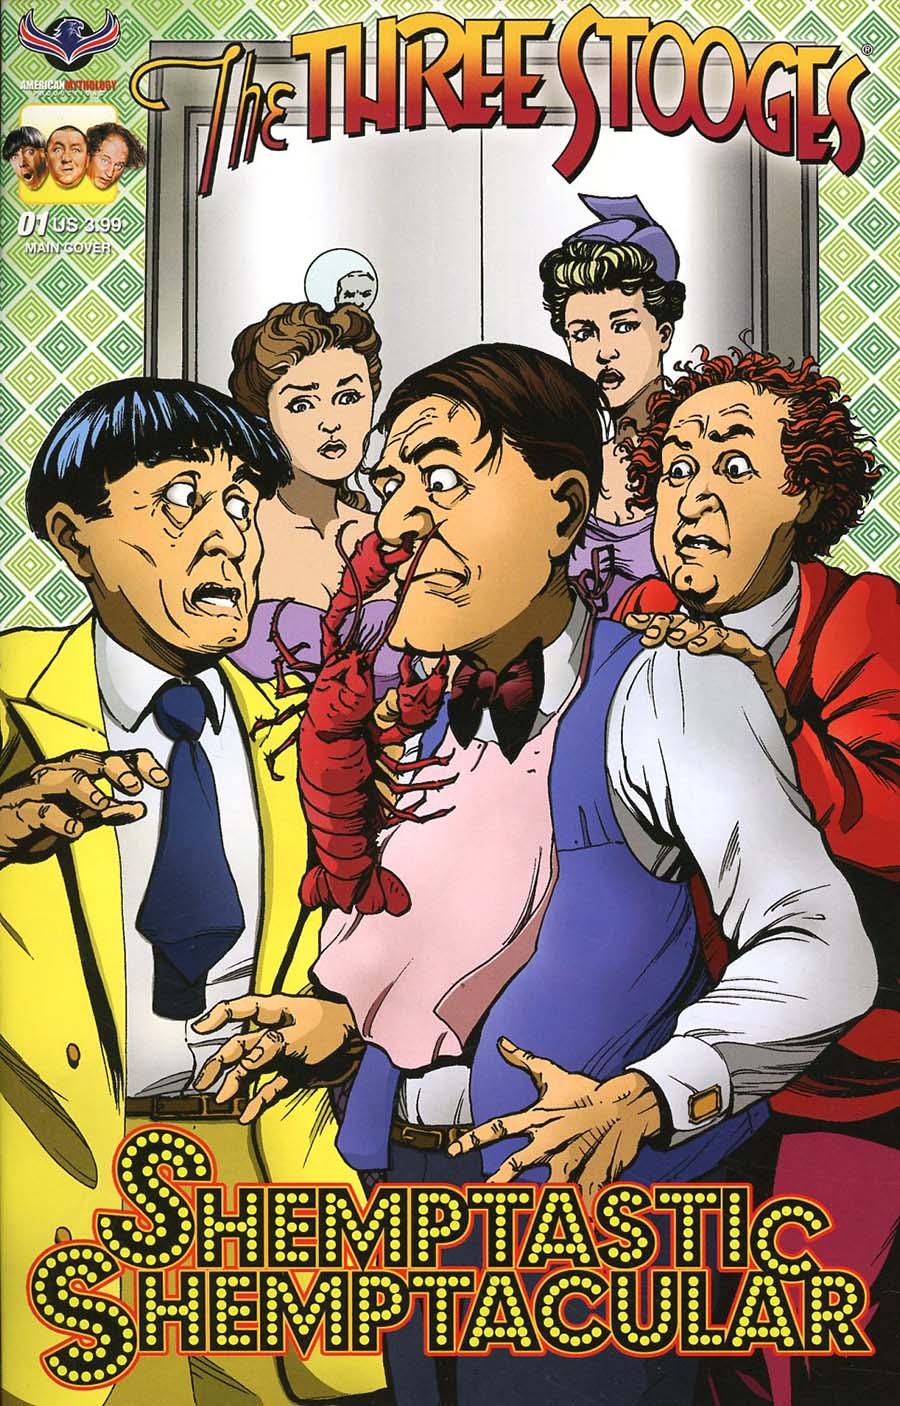 Three Stooges Shemptastic Shemptacular Special Cover A Regular Greg LaRocque Cover